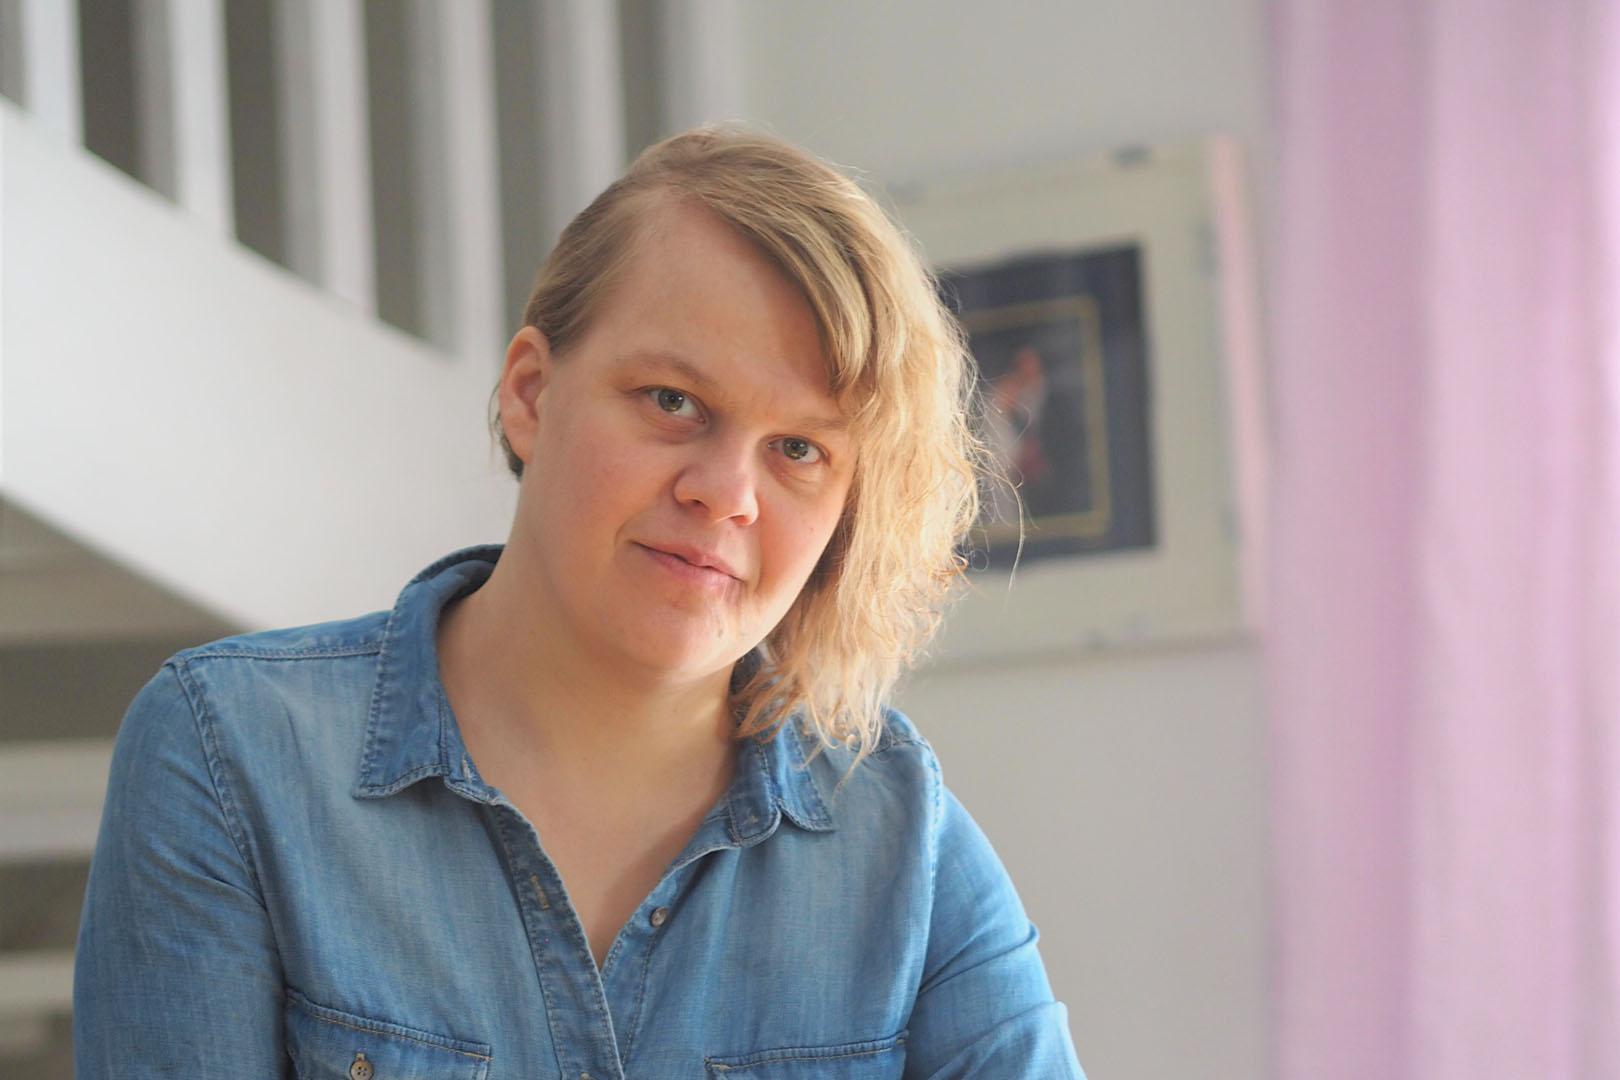 Keltainen Keinutuoli, Virpi Mäkinen, Something coarse, something delicate, Scan Magazine